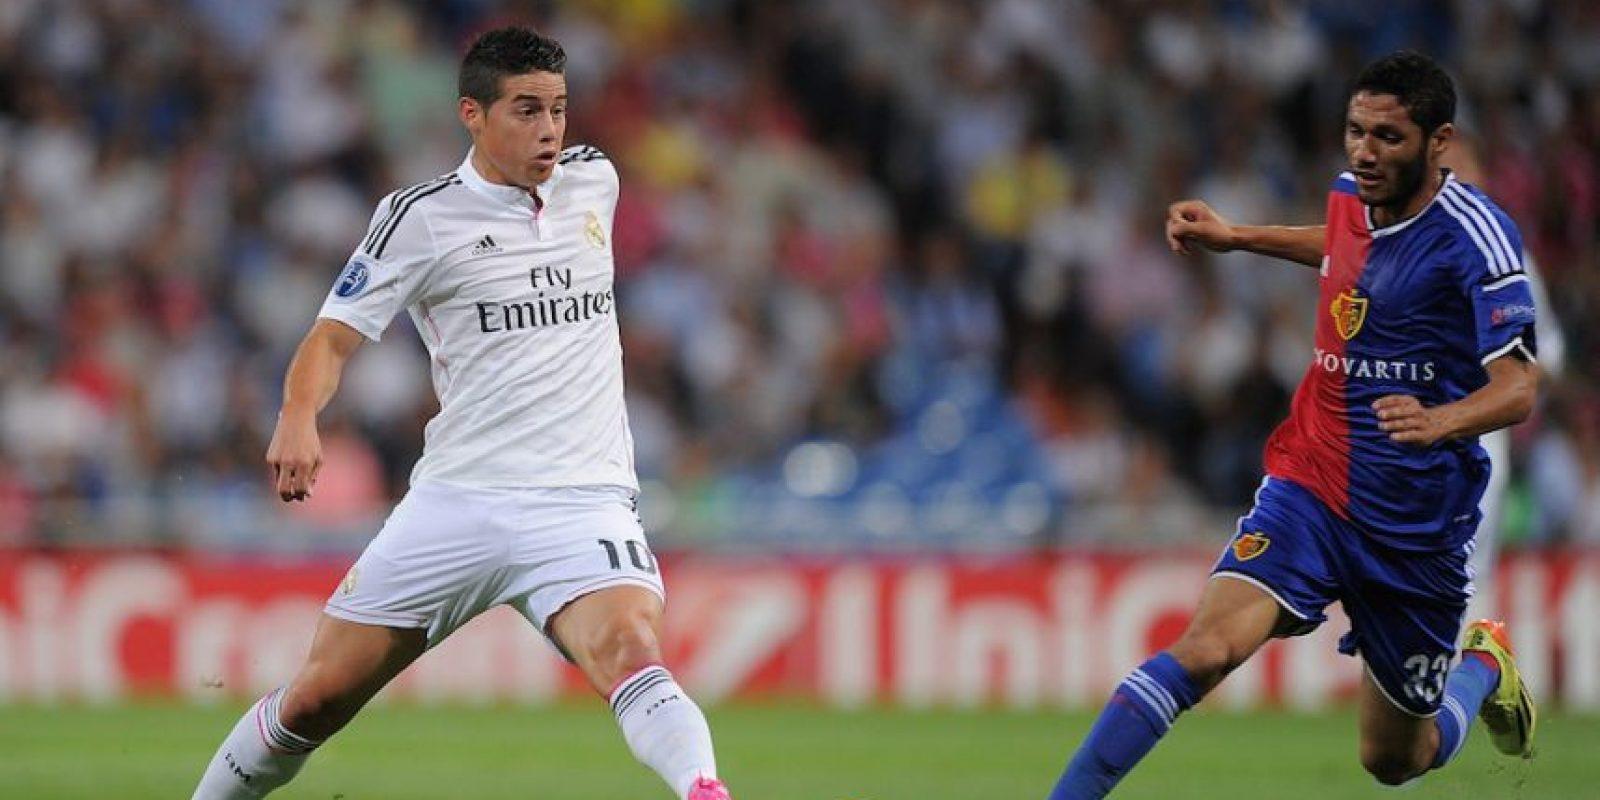 James contra el Basel en la UEFA Champions League. Foto:Getty Images